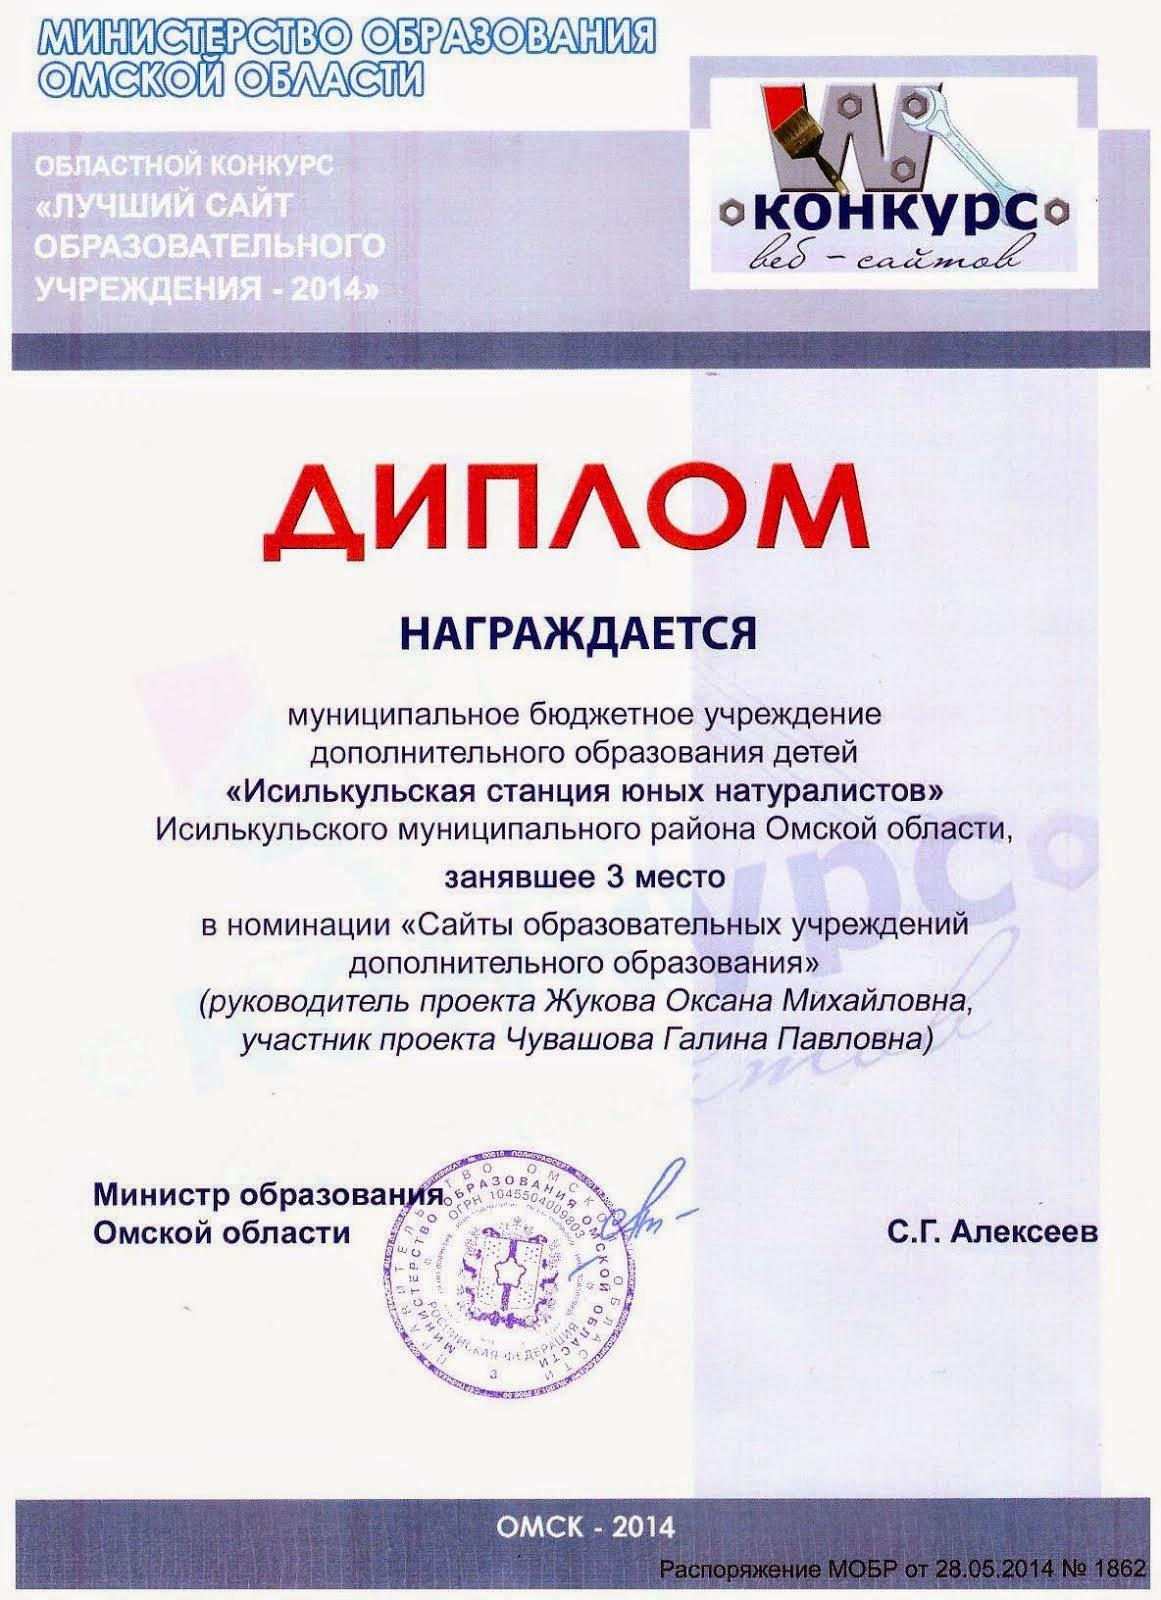 Призеры областного конкурса